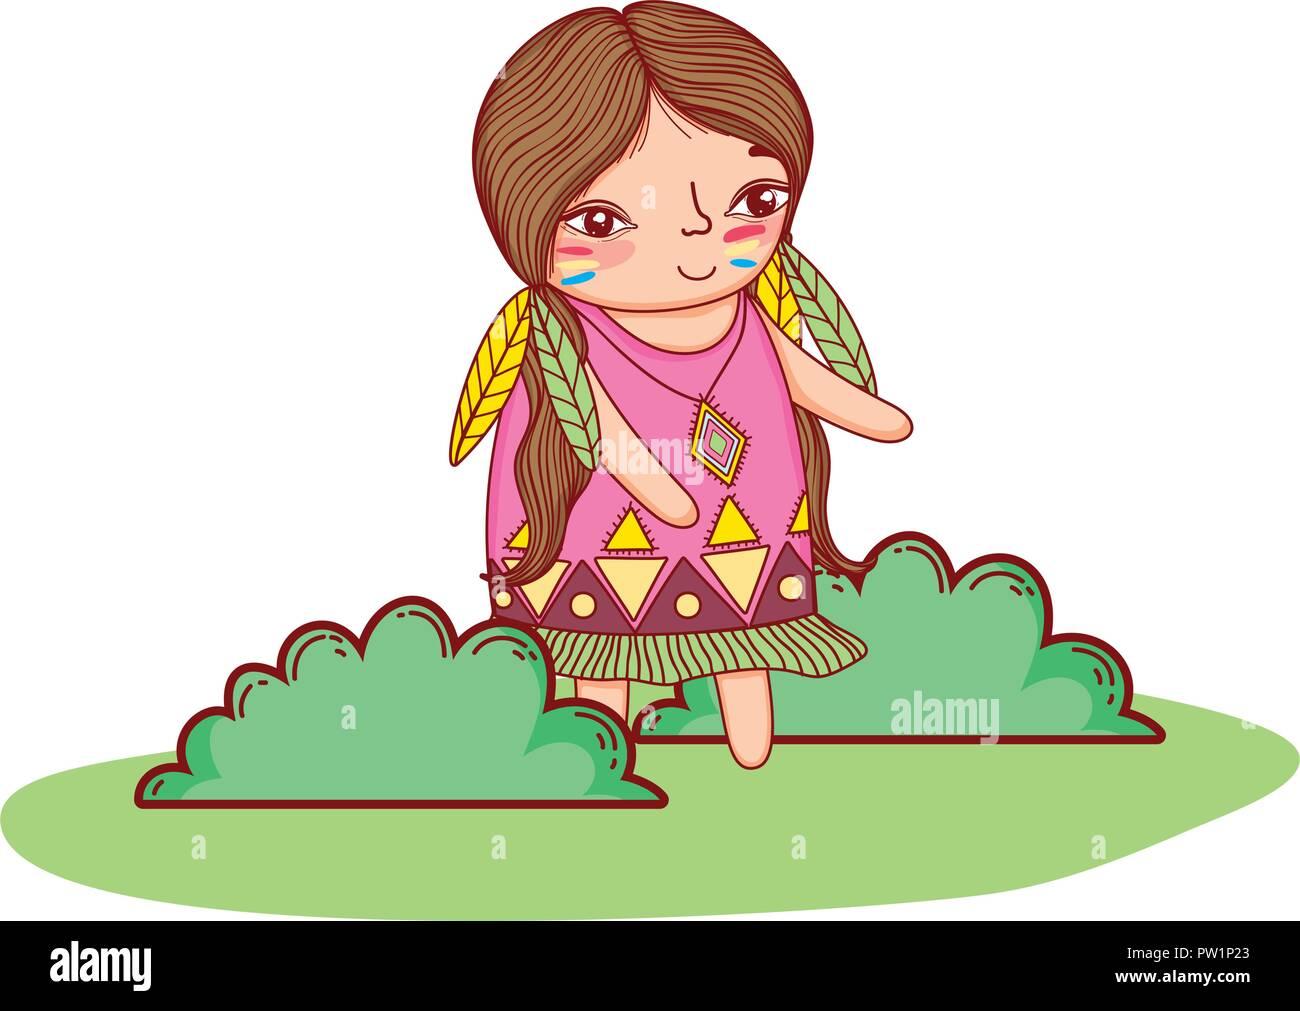 American indian girl cartoon - Stock Image